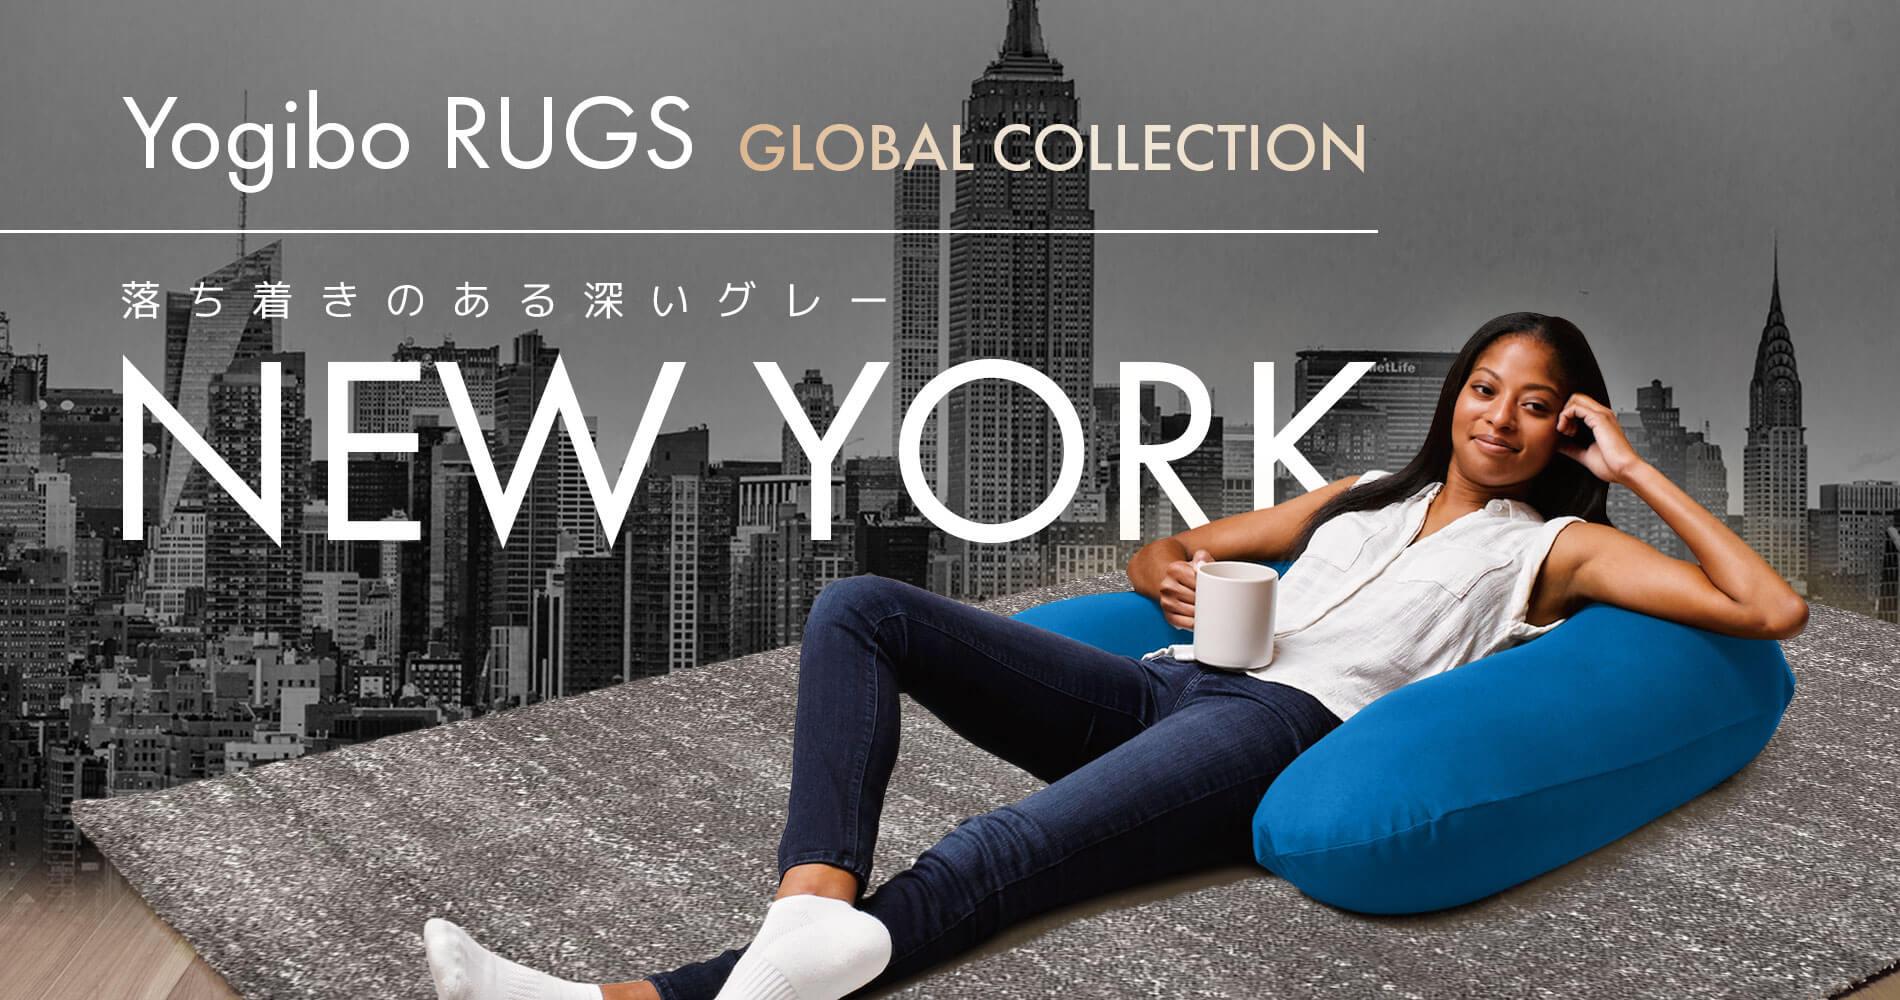 Yogibo Rugs New York(ヨギボーラグ ニューヨーク)